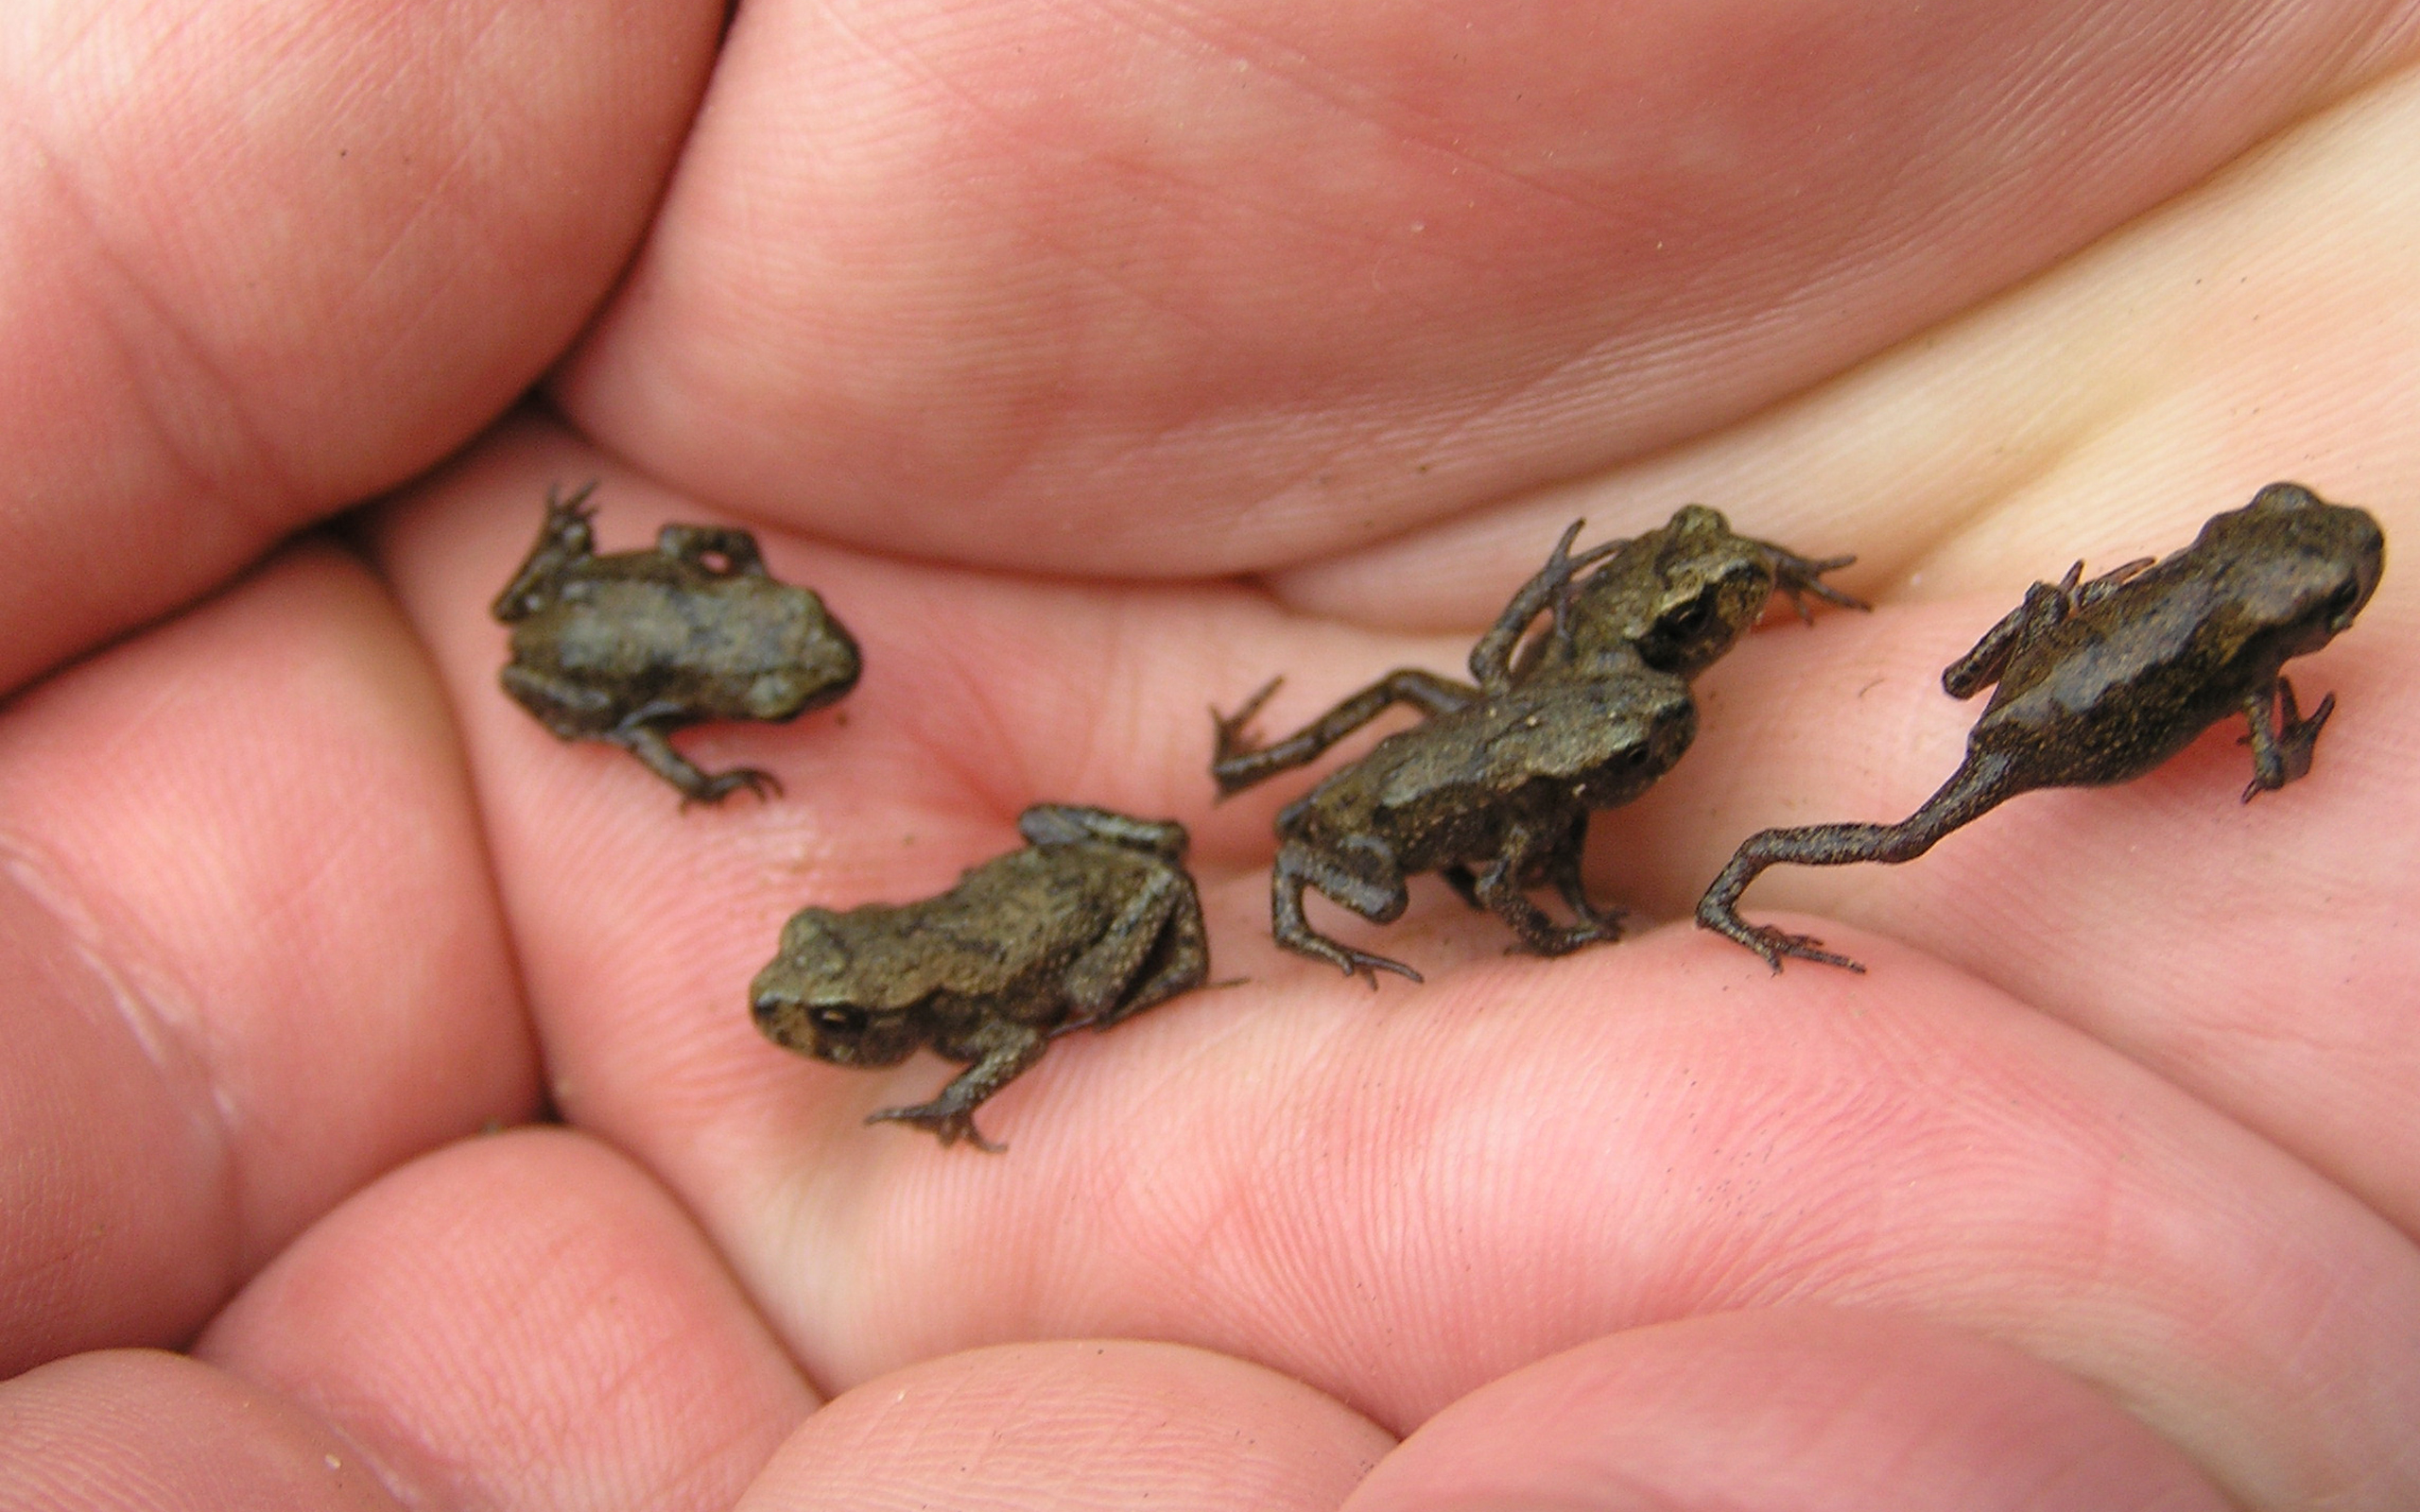 Amphibians animals frogs hands palm wallpaper HQ WALLPAPER - (#174680)